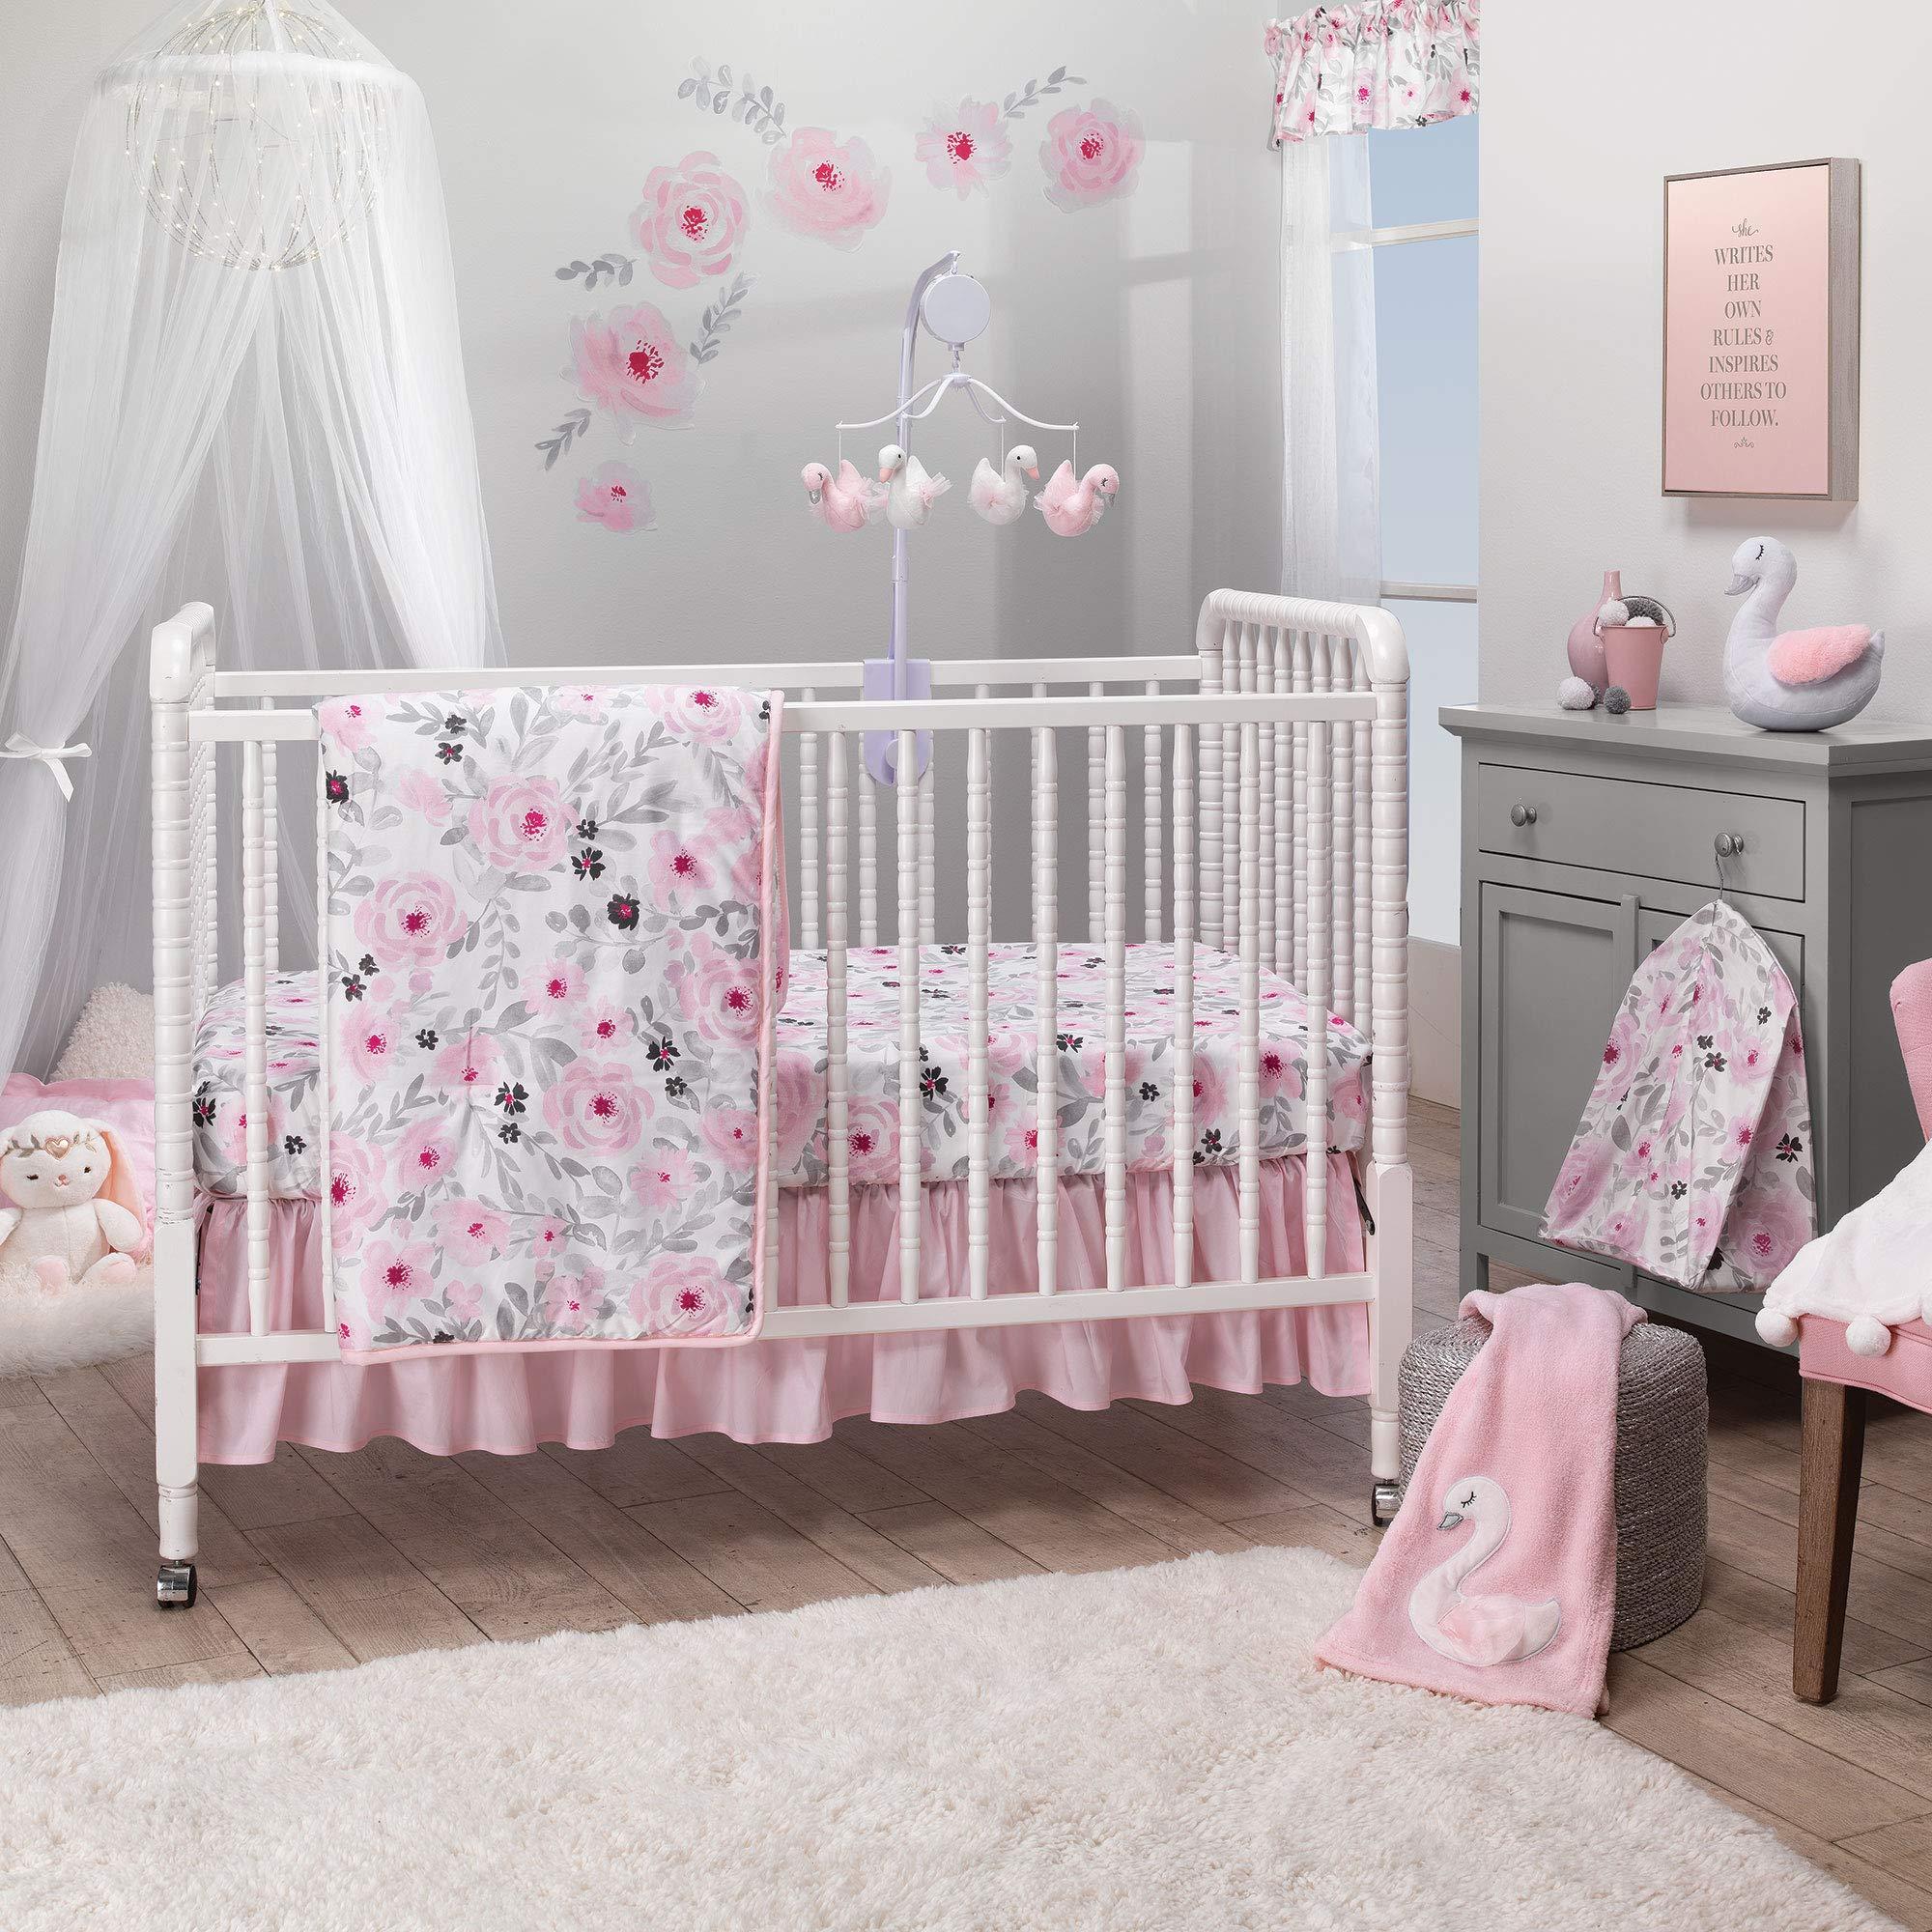 Bedtime Originals Blossom Pink Watercolor Floral 3-Piece Baby Crib Bedding Set by Bedtime Originals